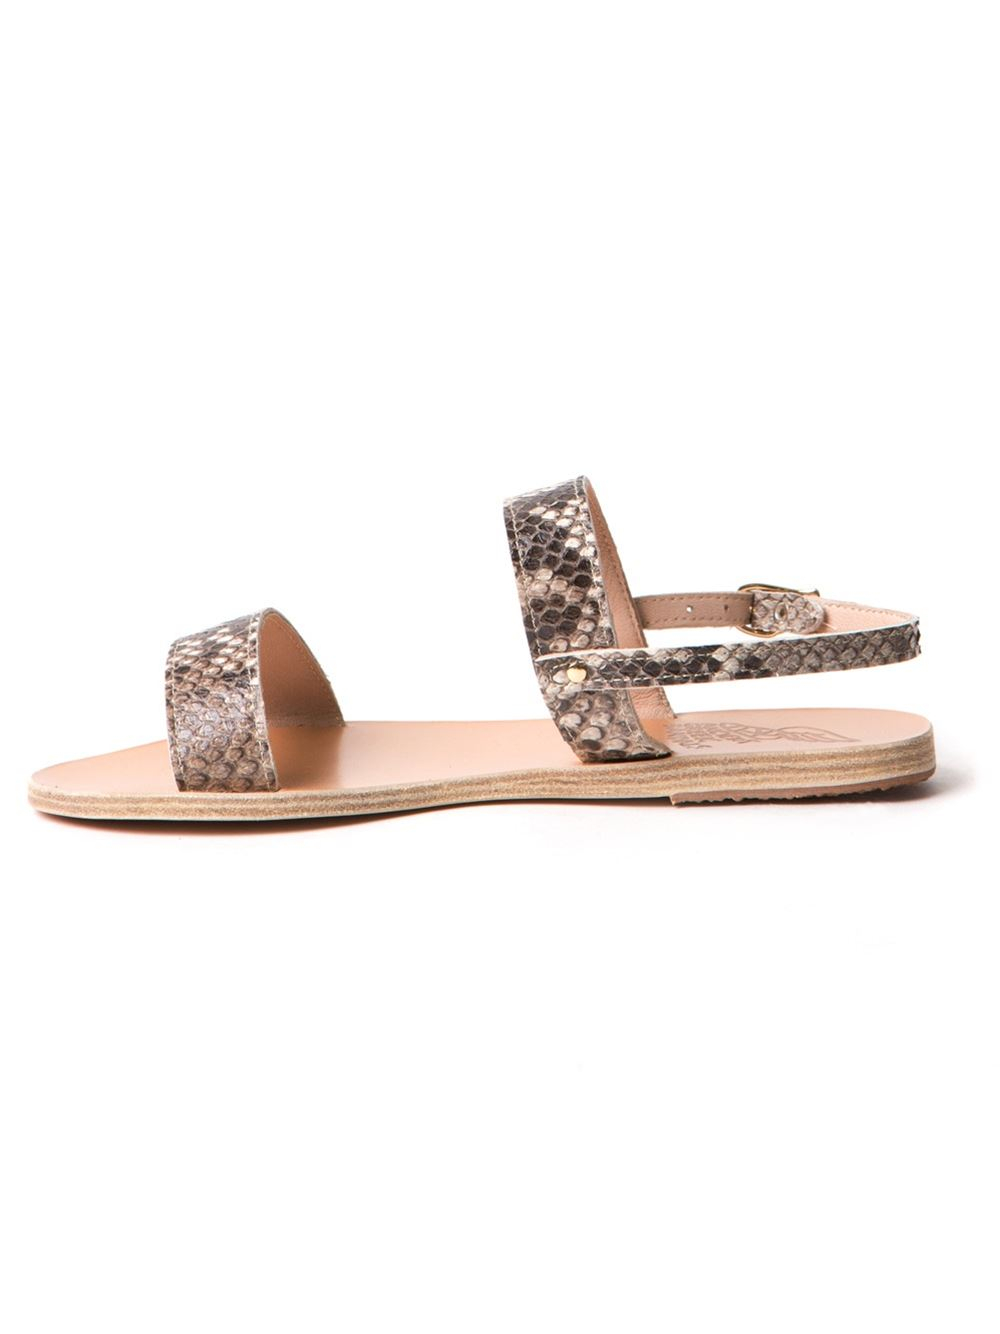 Ancient Greek Sandals Clio Flat Sandal In Beige Nude  Neutrals  Lyst-9756